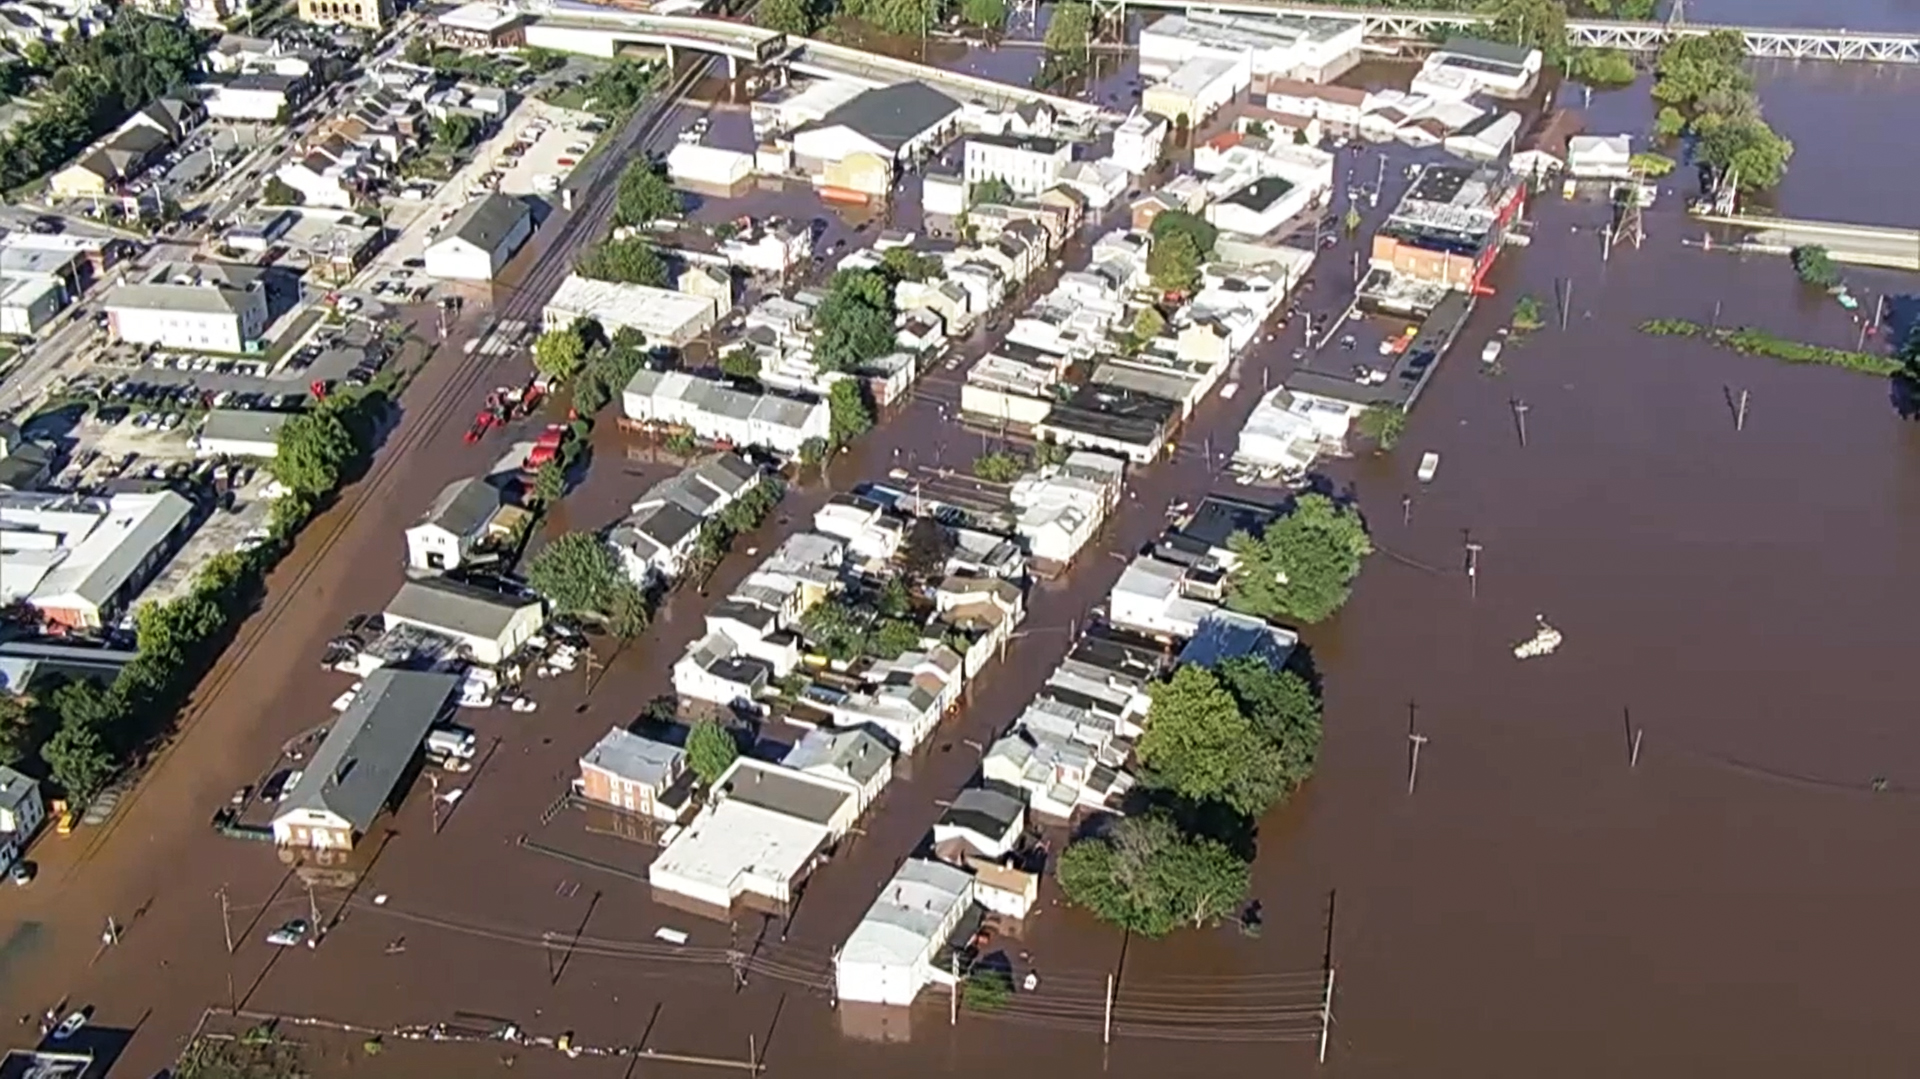 Video shows destruction in Philadelphia area after Ida unleashes tornadoes, rain